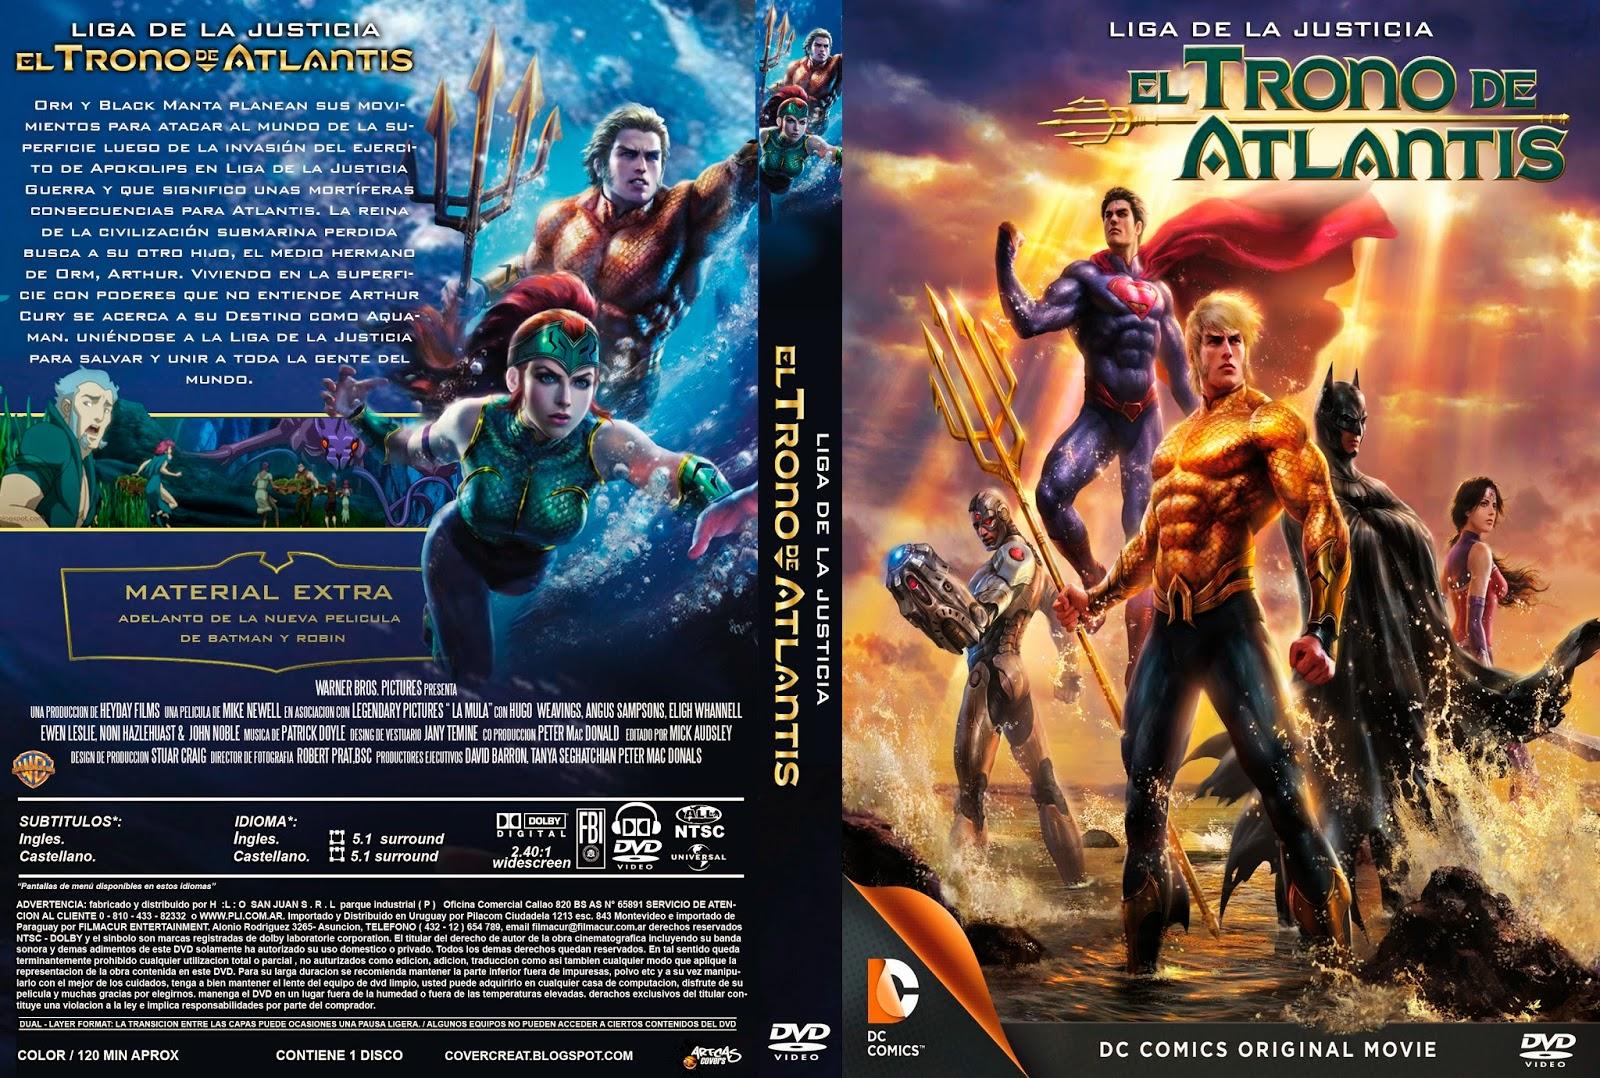 La Liga De La Justicia El Trono De Atlantis DVD